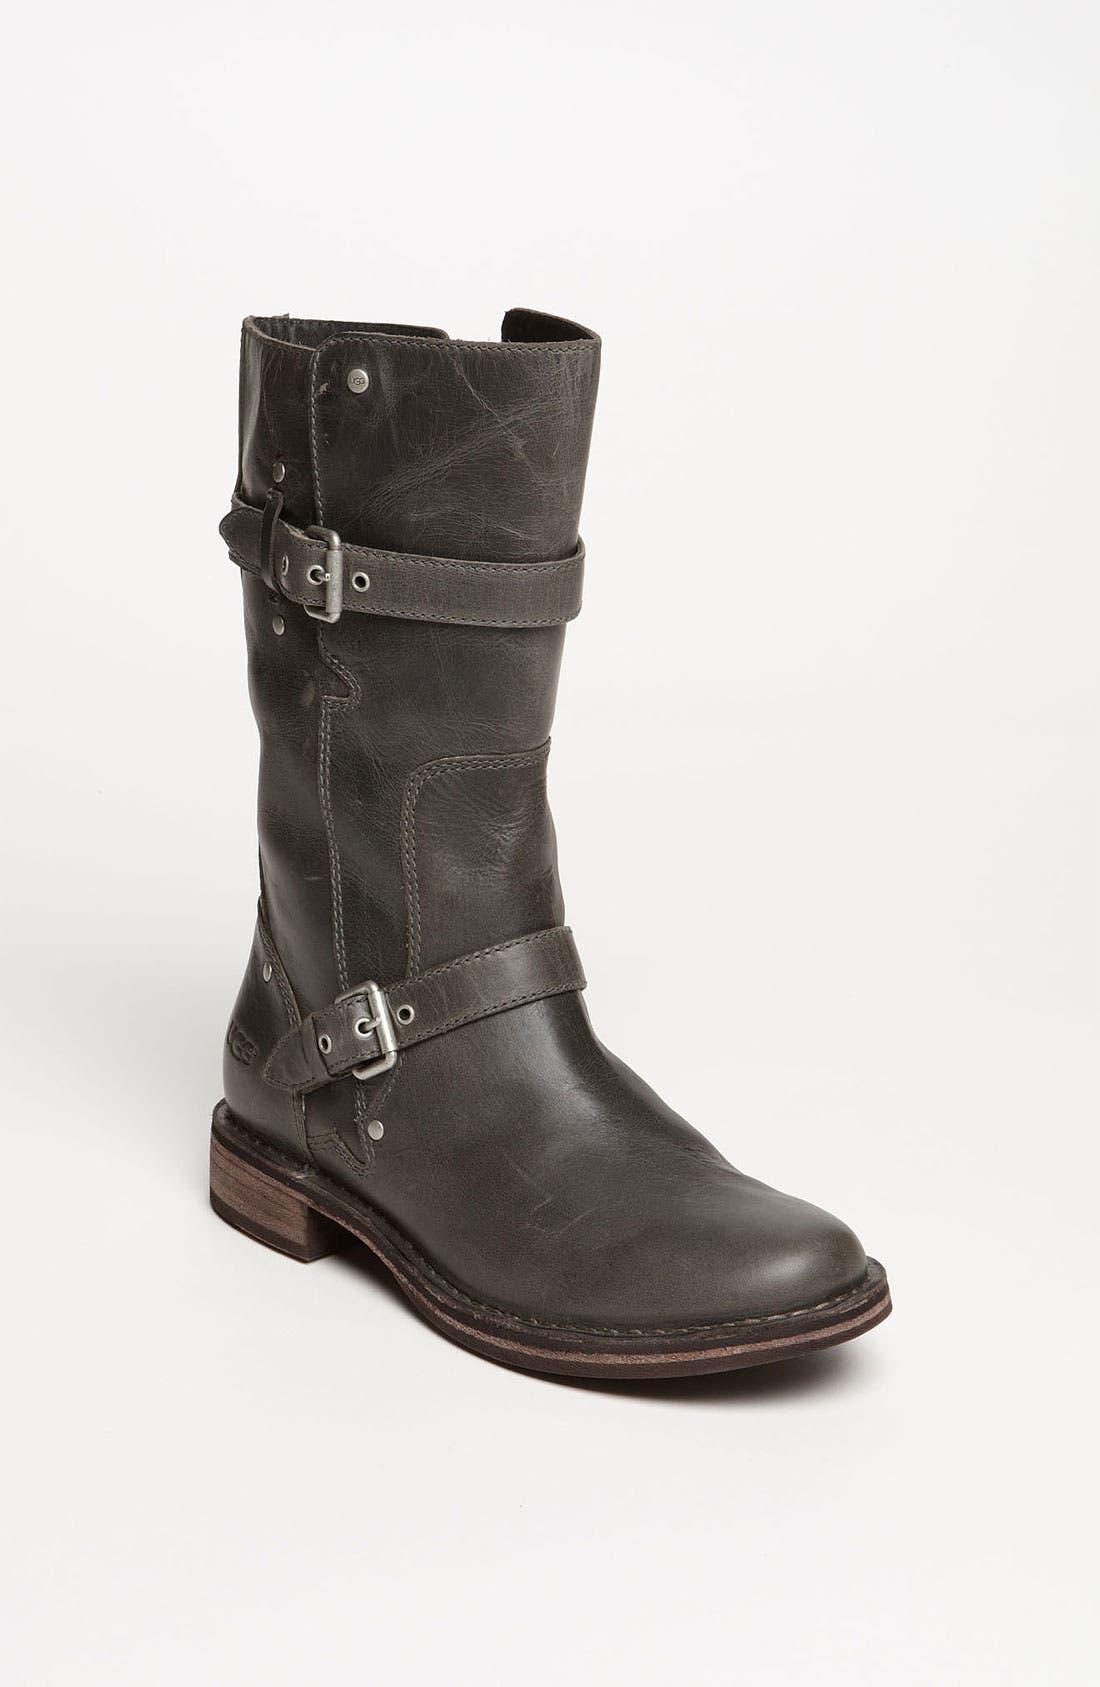 Alternate Image 1 Selected - UGG® Australia 'Gillespie' Boot (Women)